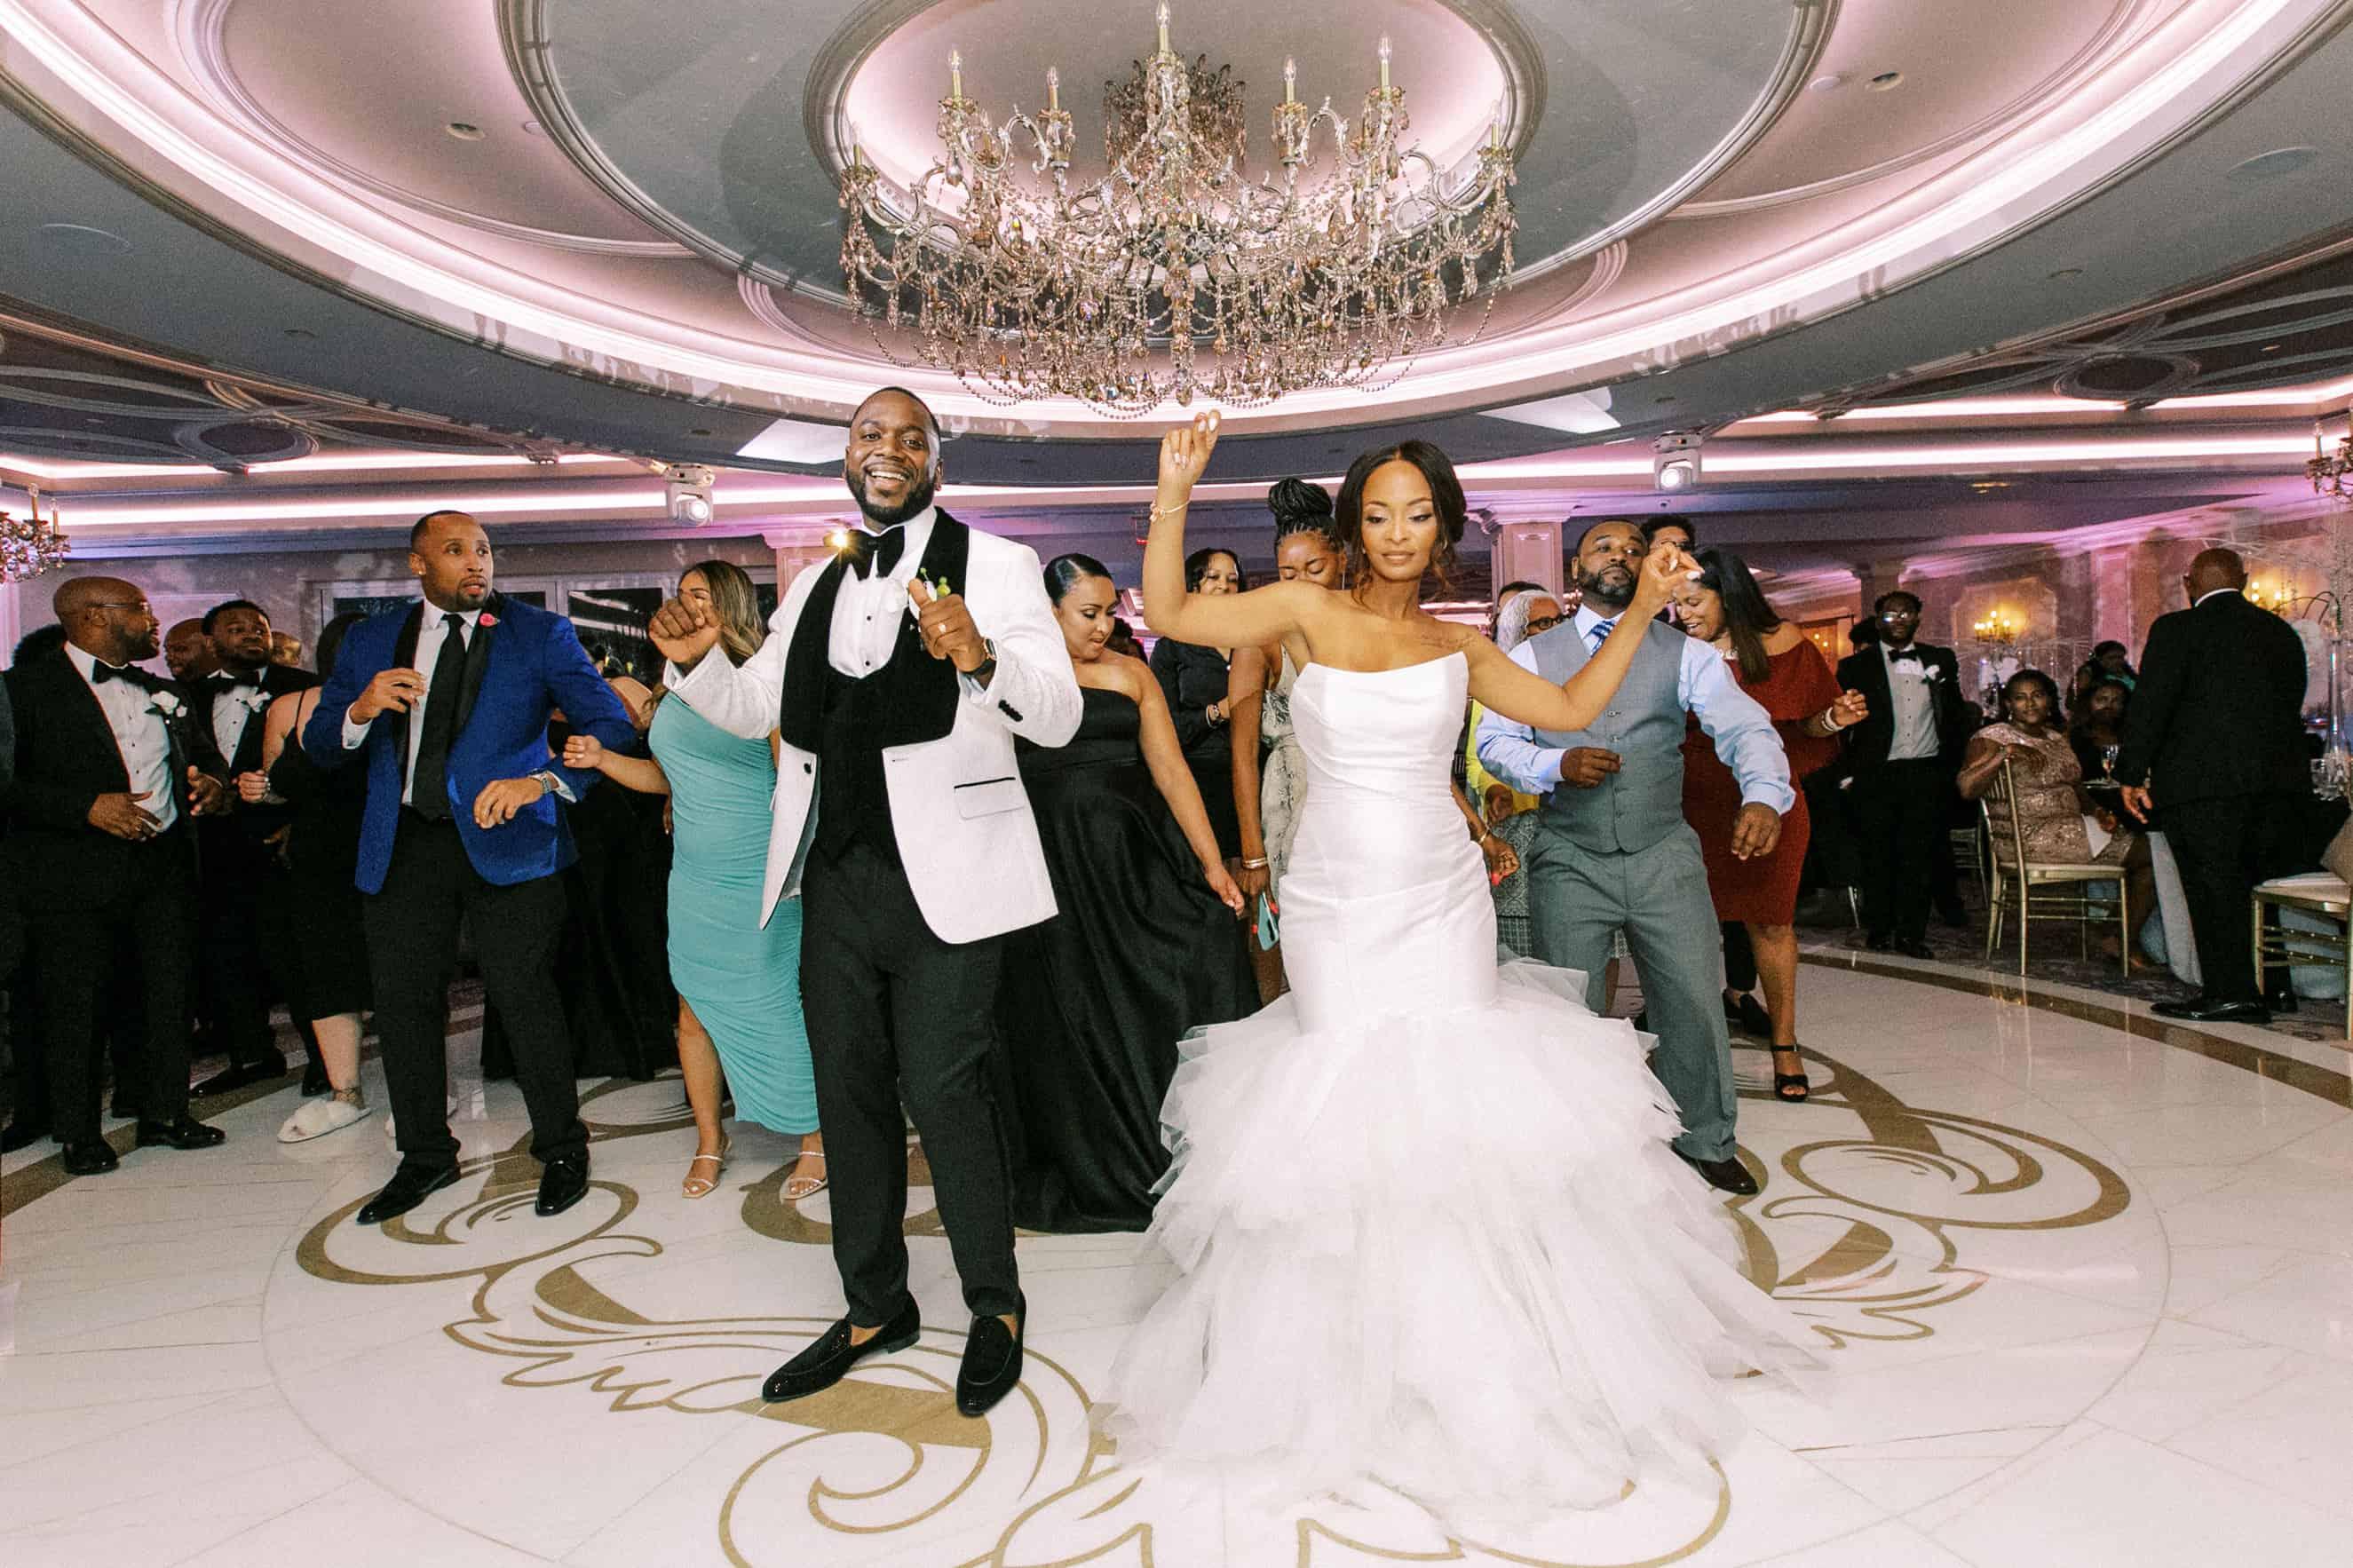 New Jersey Wedding Receptions Location Photos